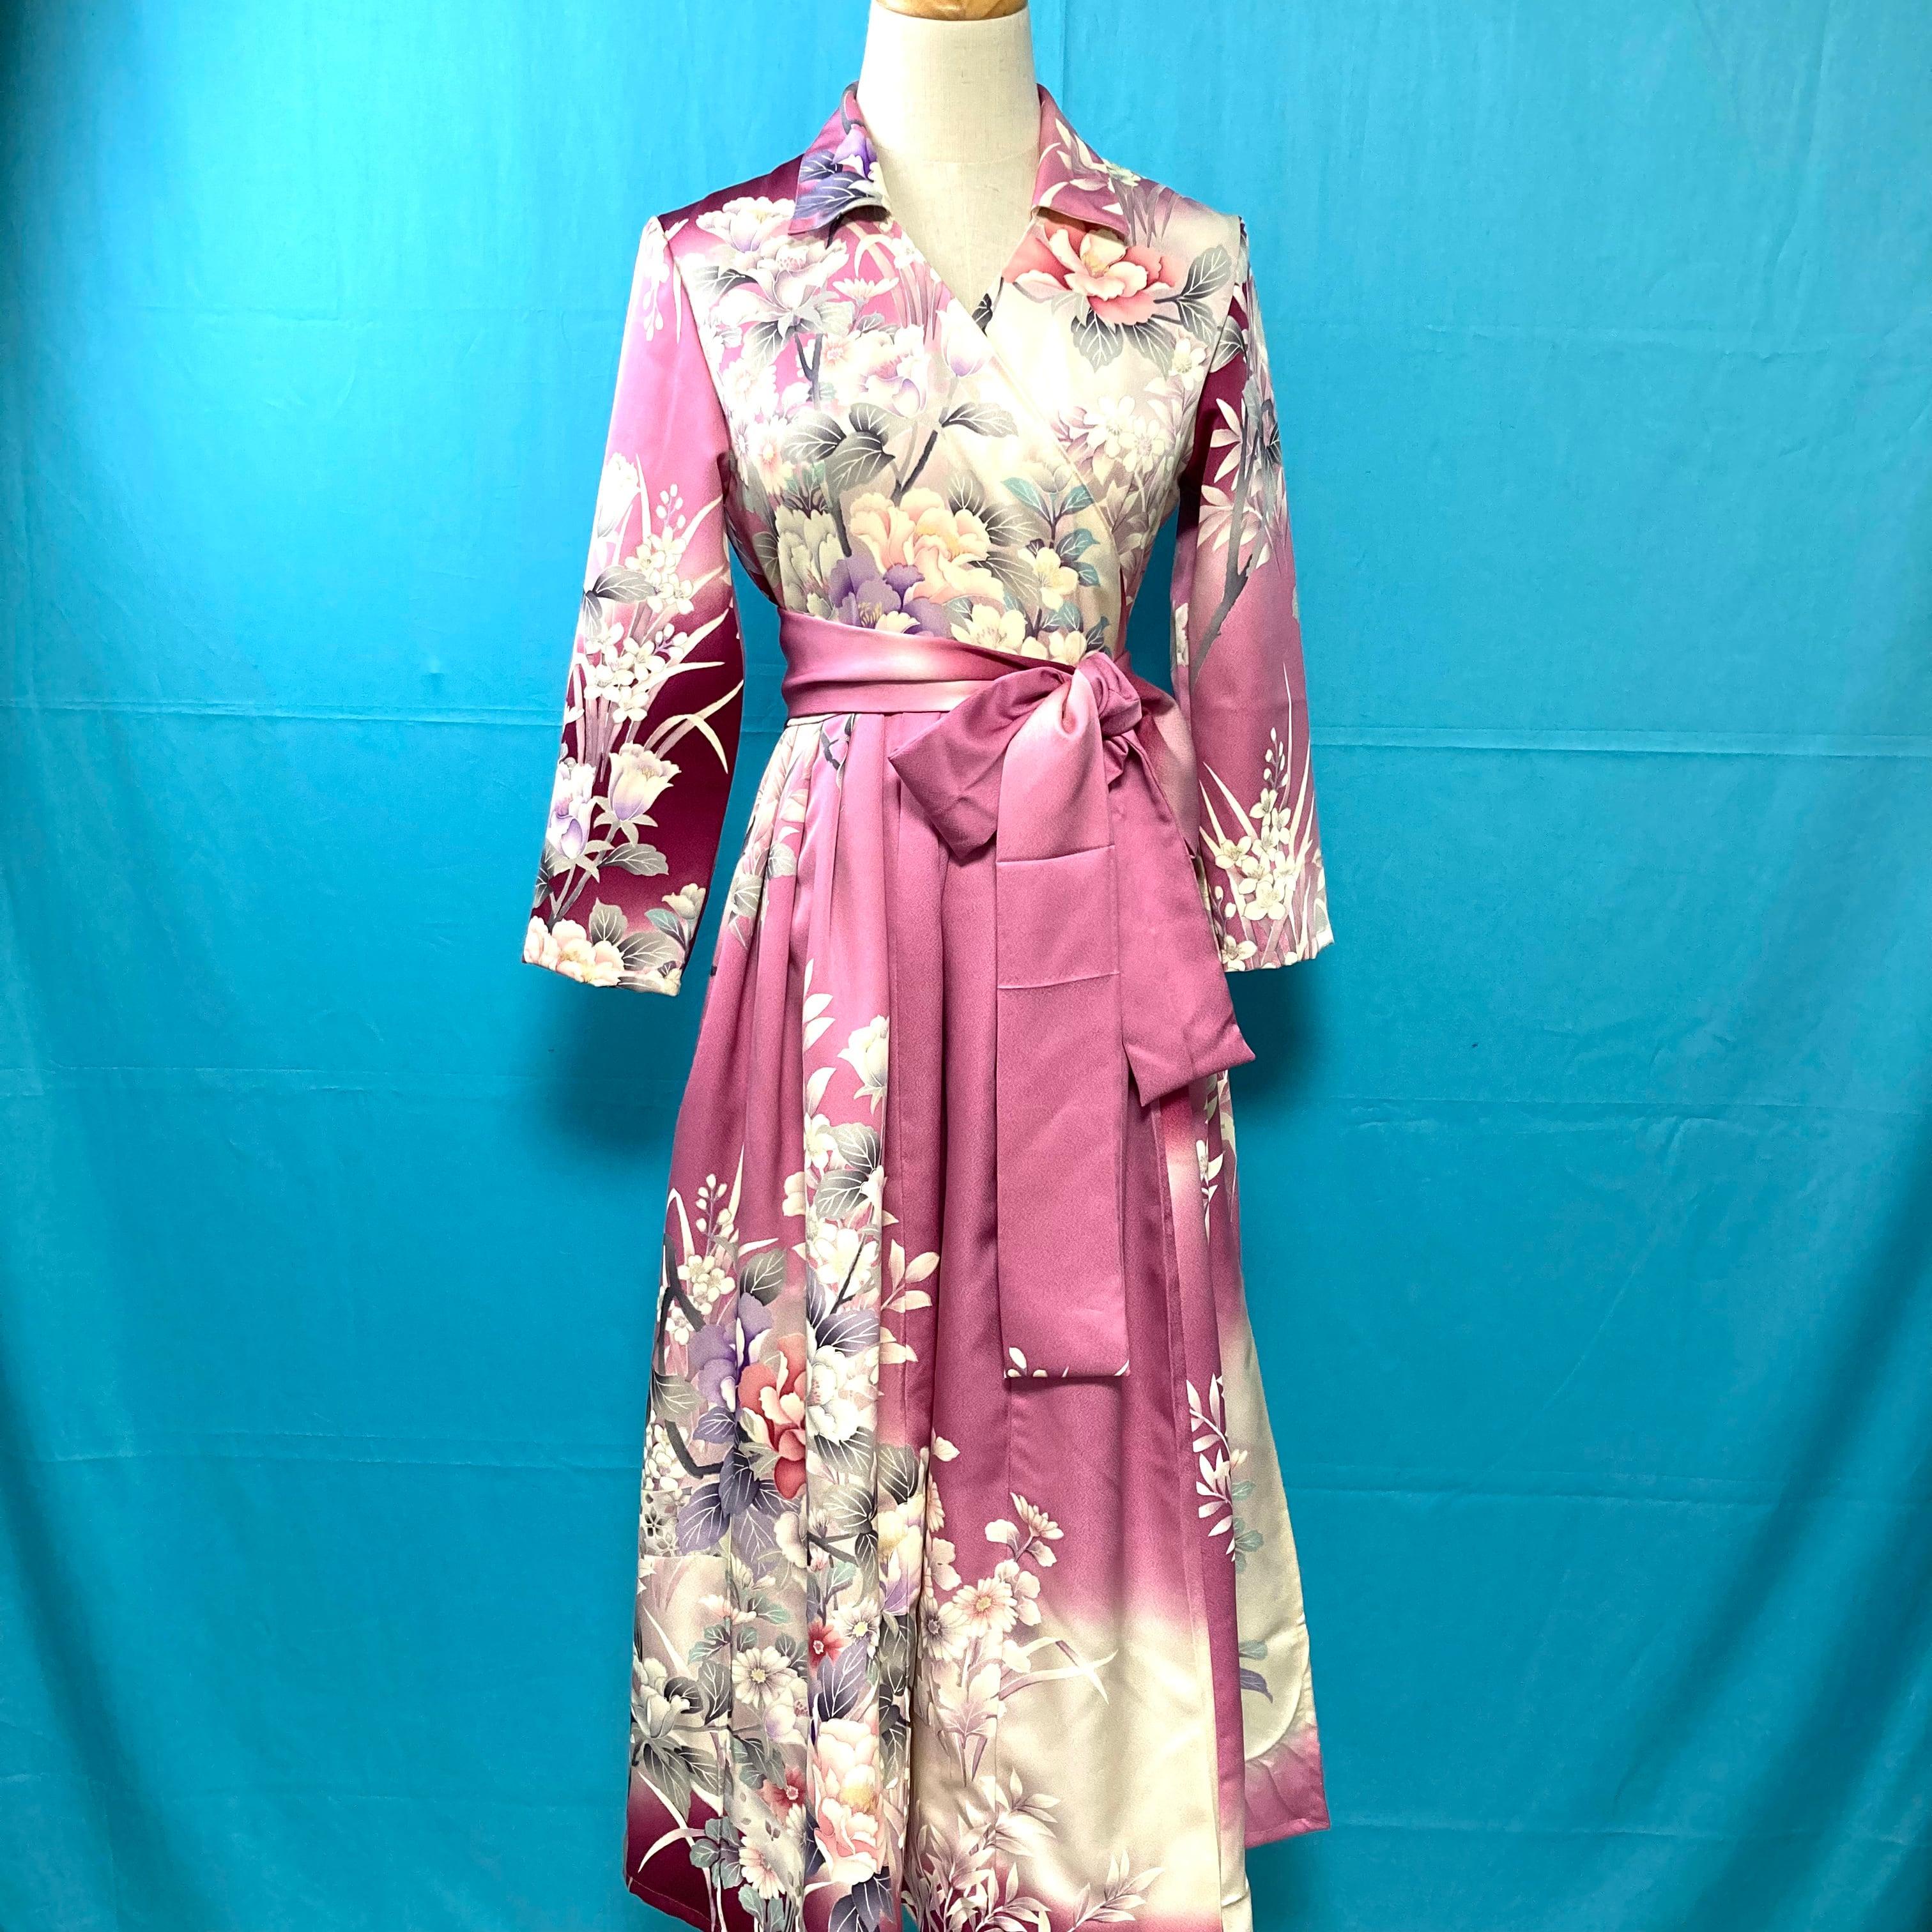 Vintage kimono wrap dress/ US 6